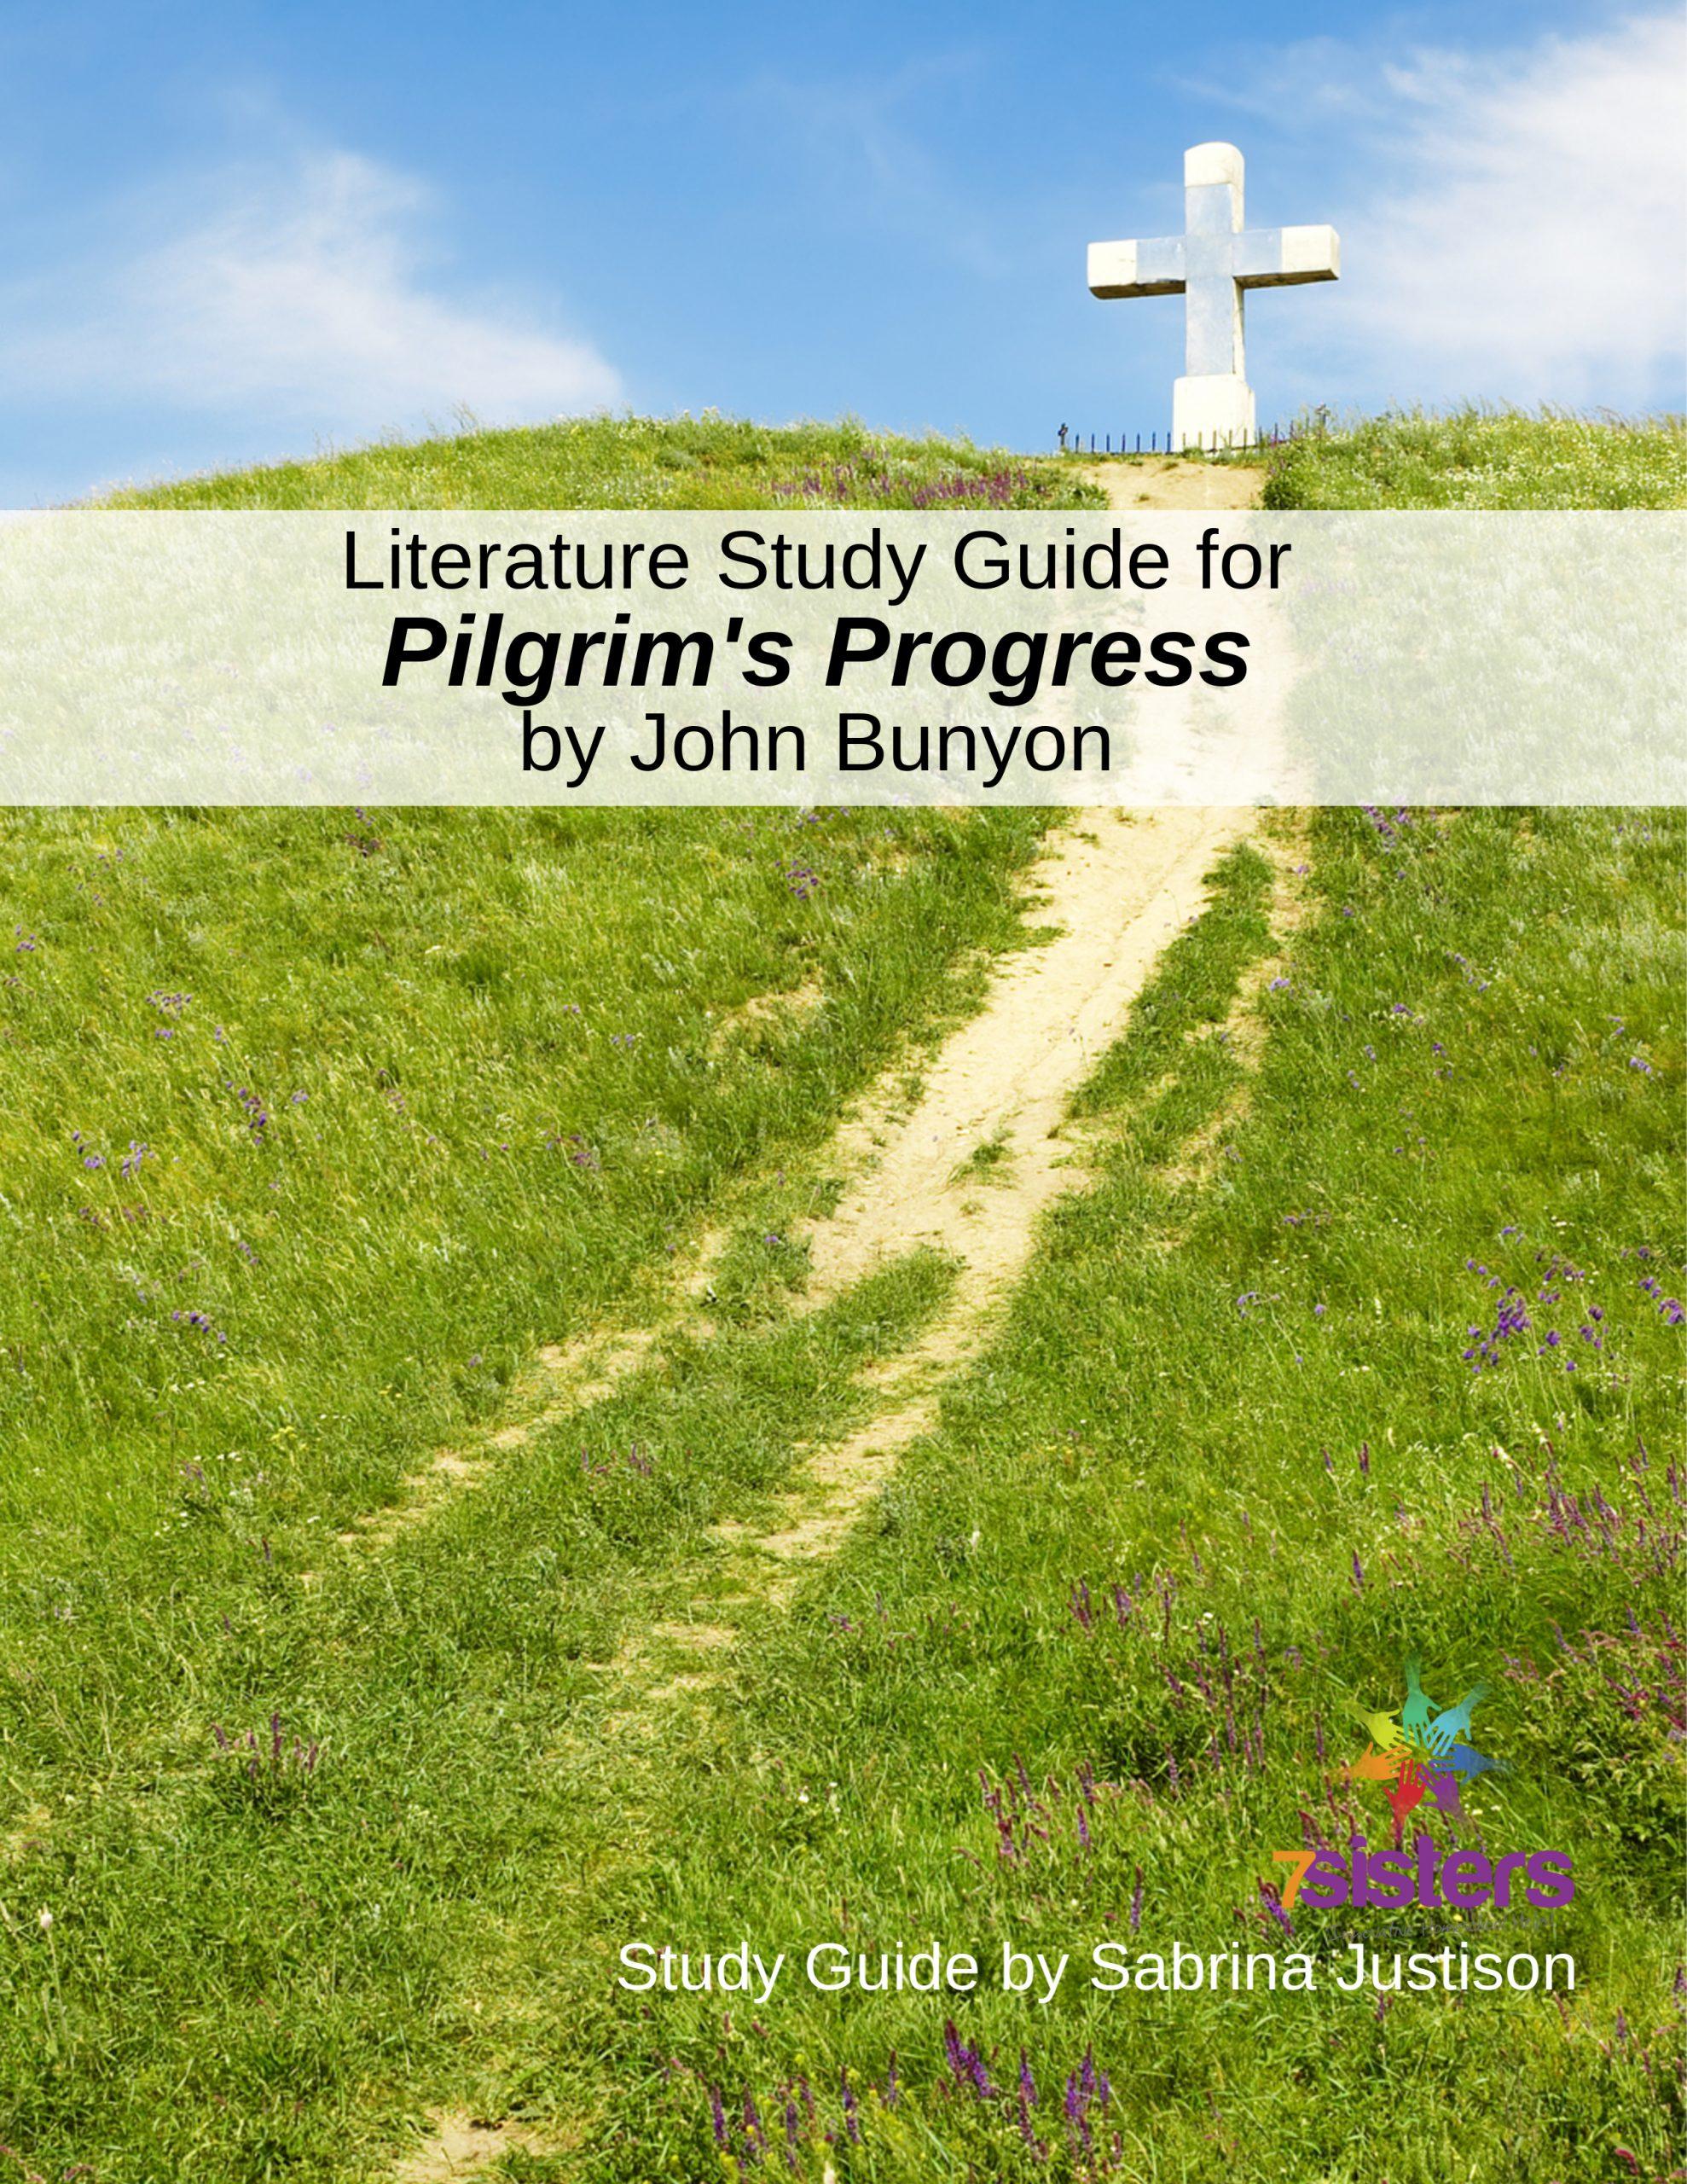 Pilgrims Progress Study Guide